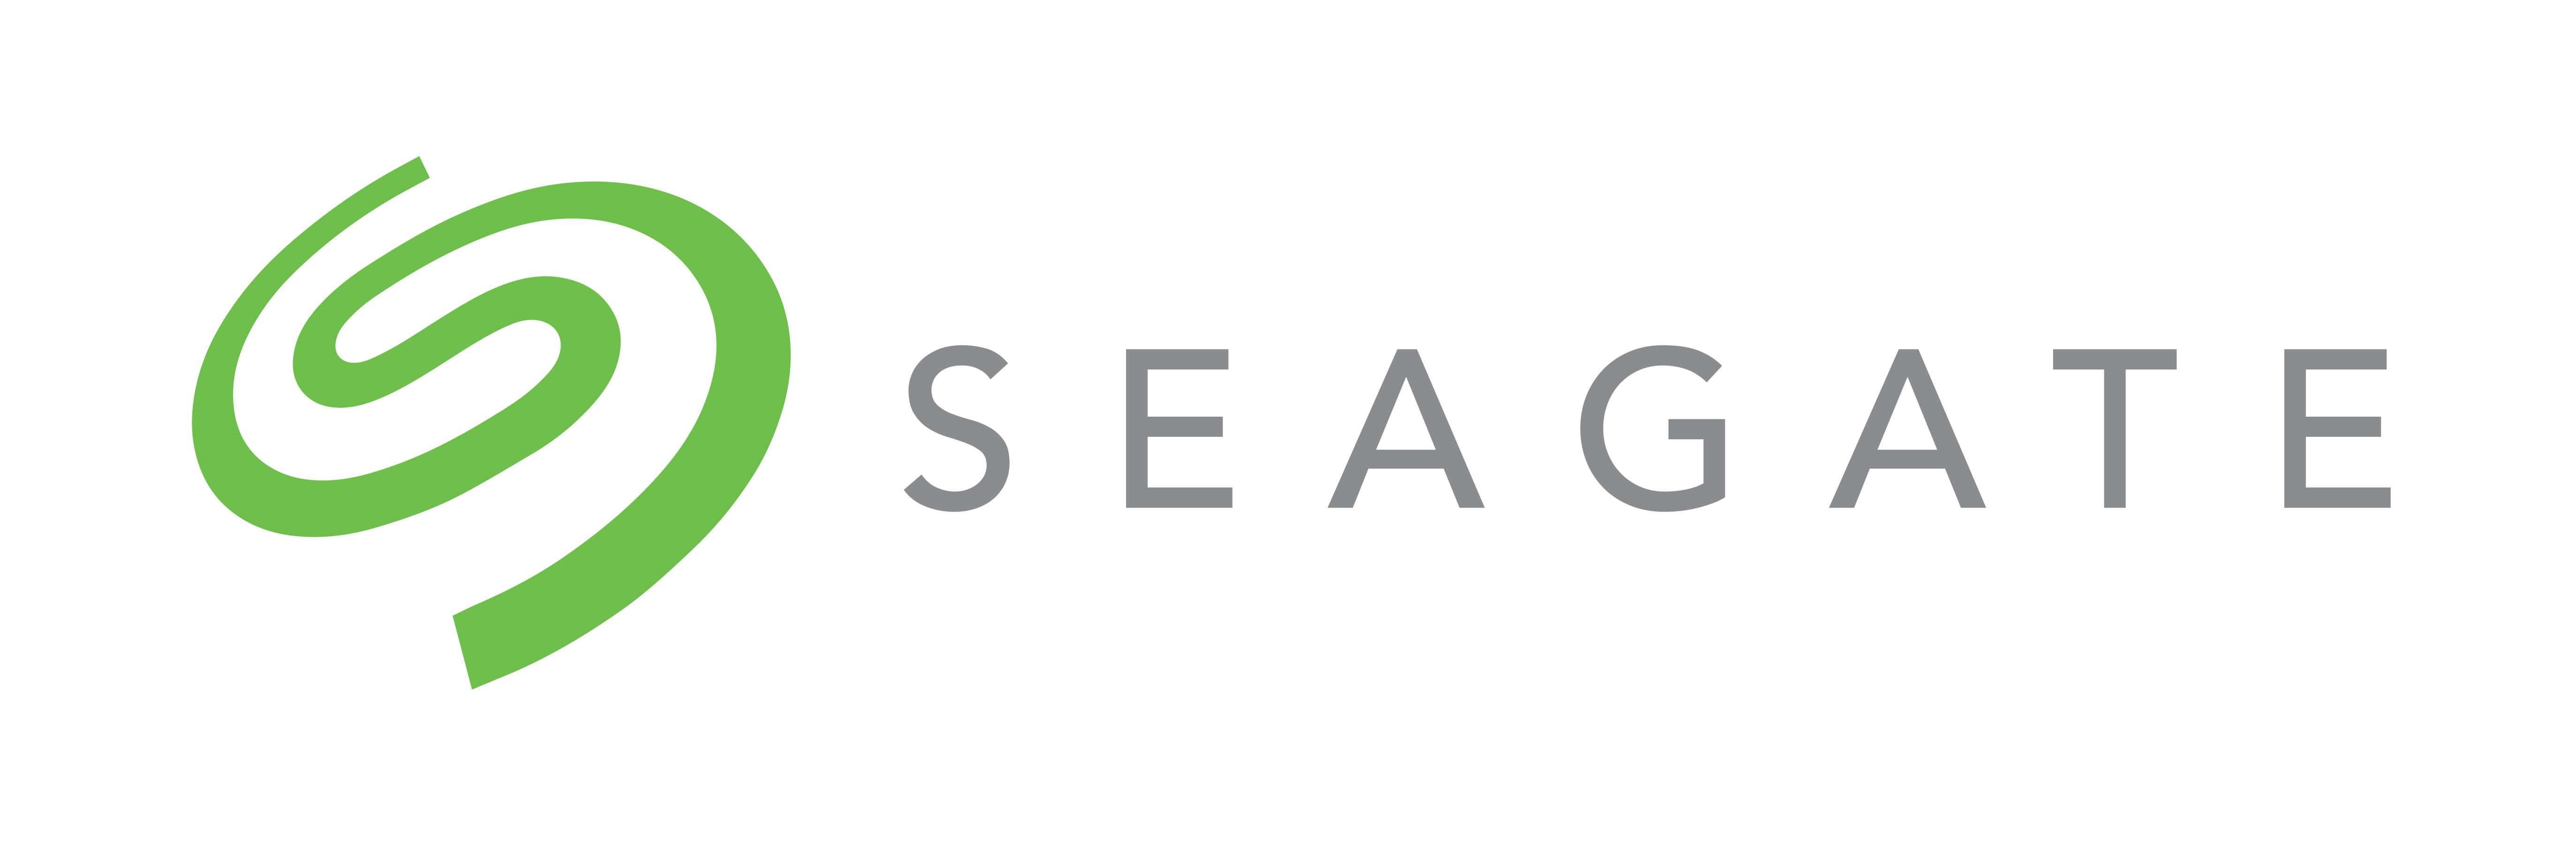 Seagate Exos 512E ST6000NM0115 - 6TB هارد اینترپرایز سیگیت